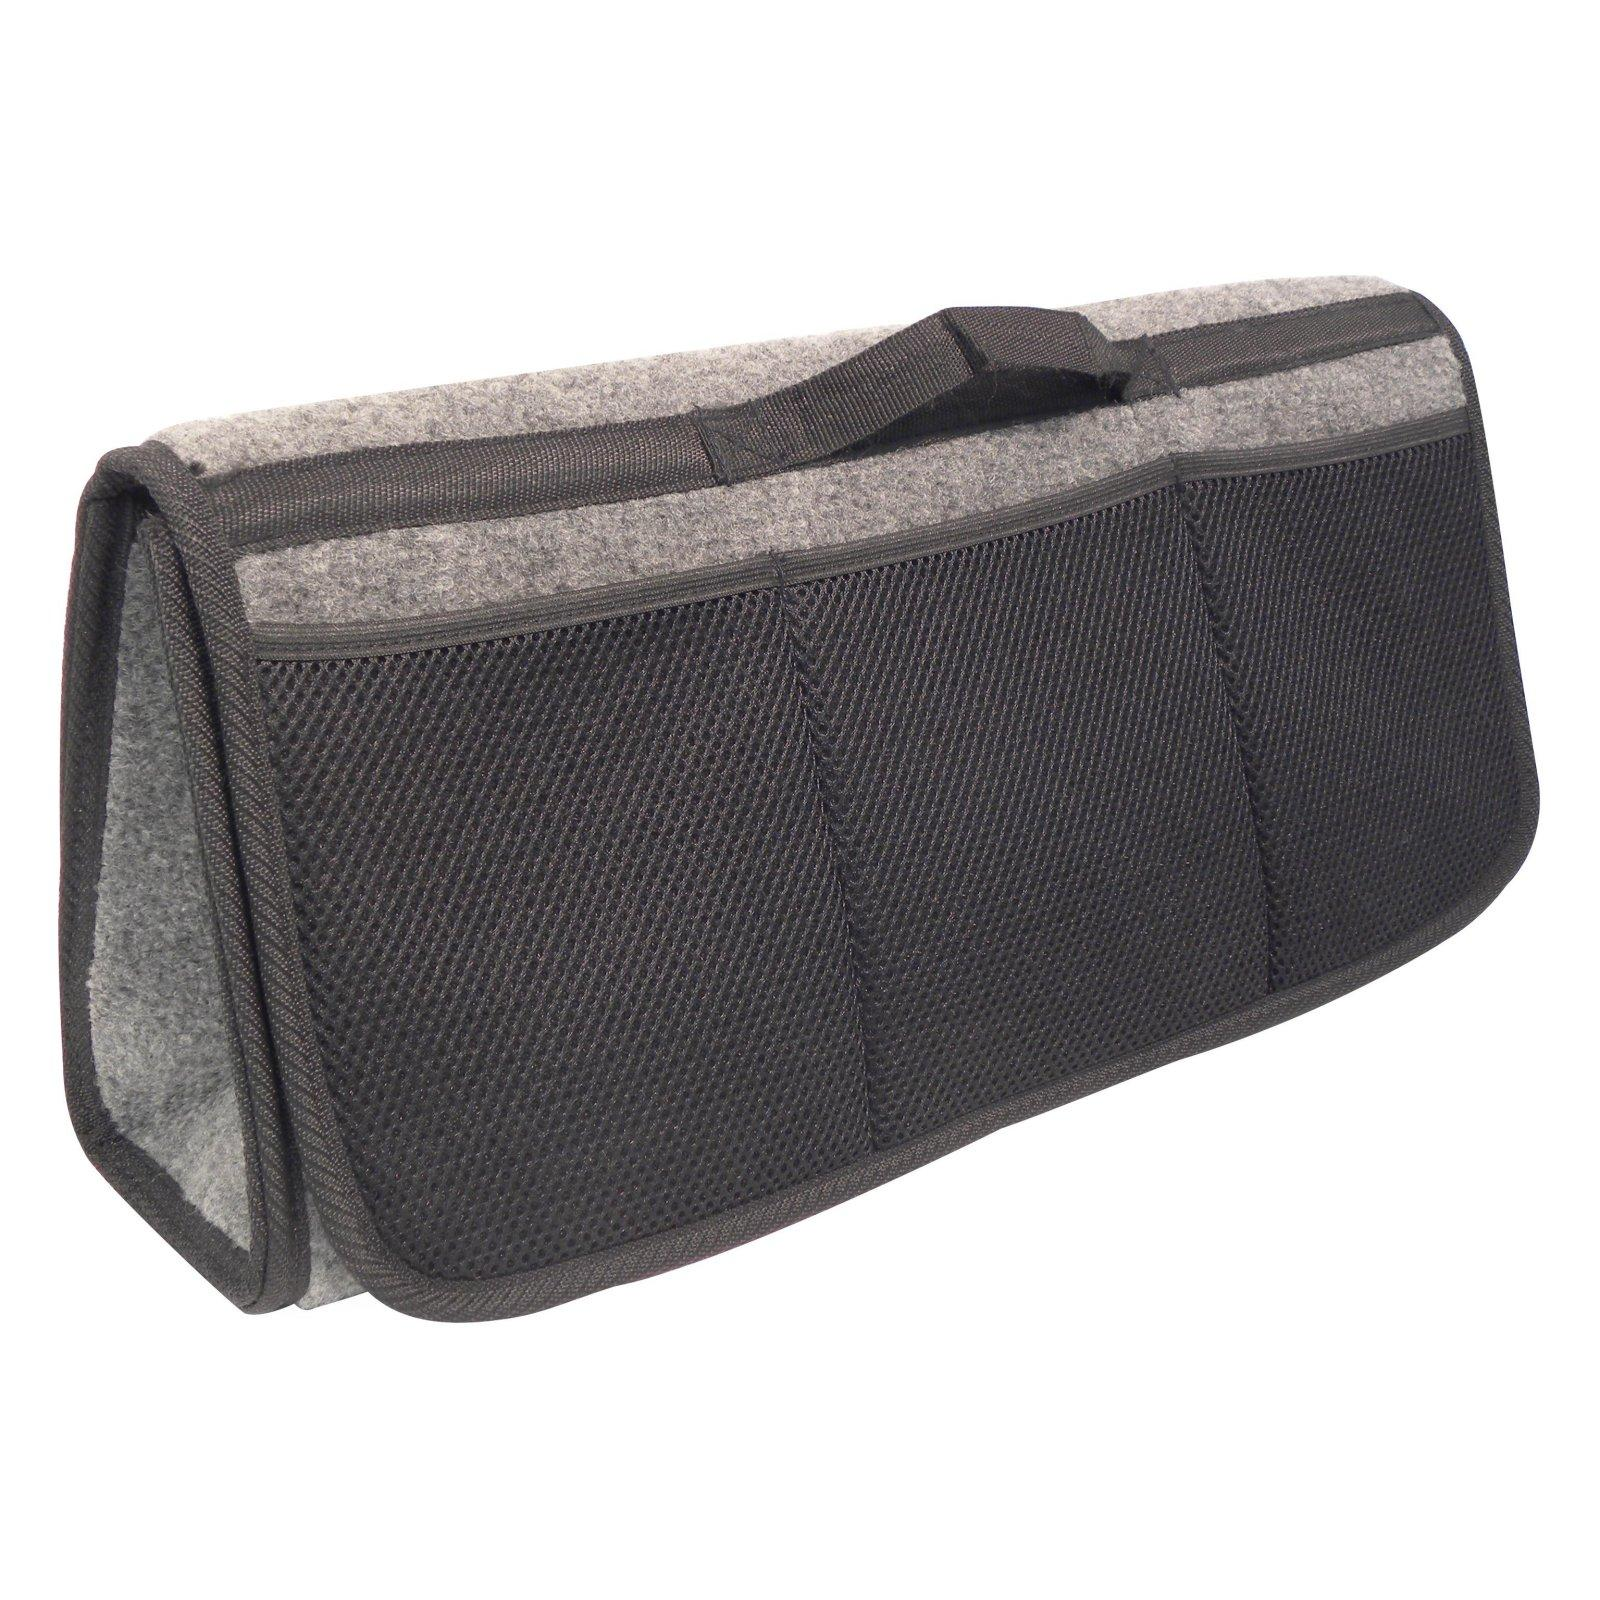 rangements adnauto sac de rangement pou 217264